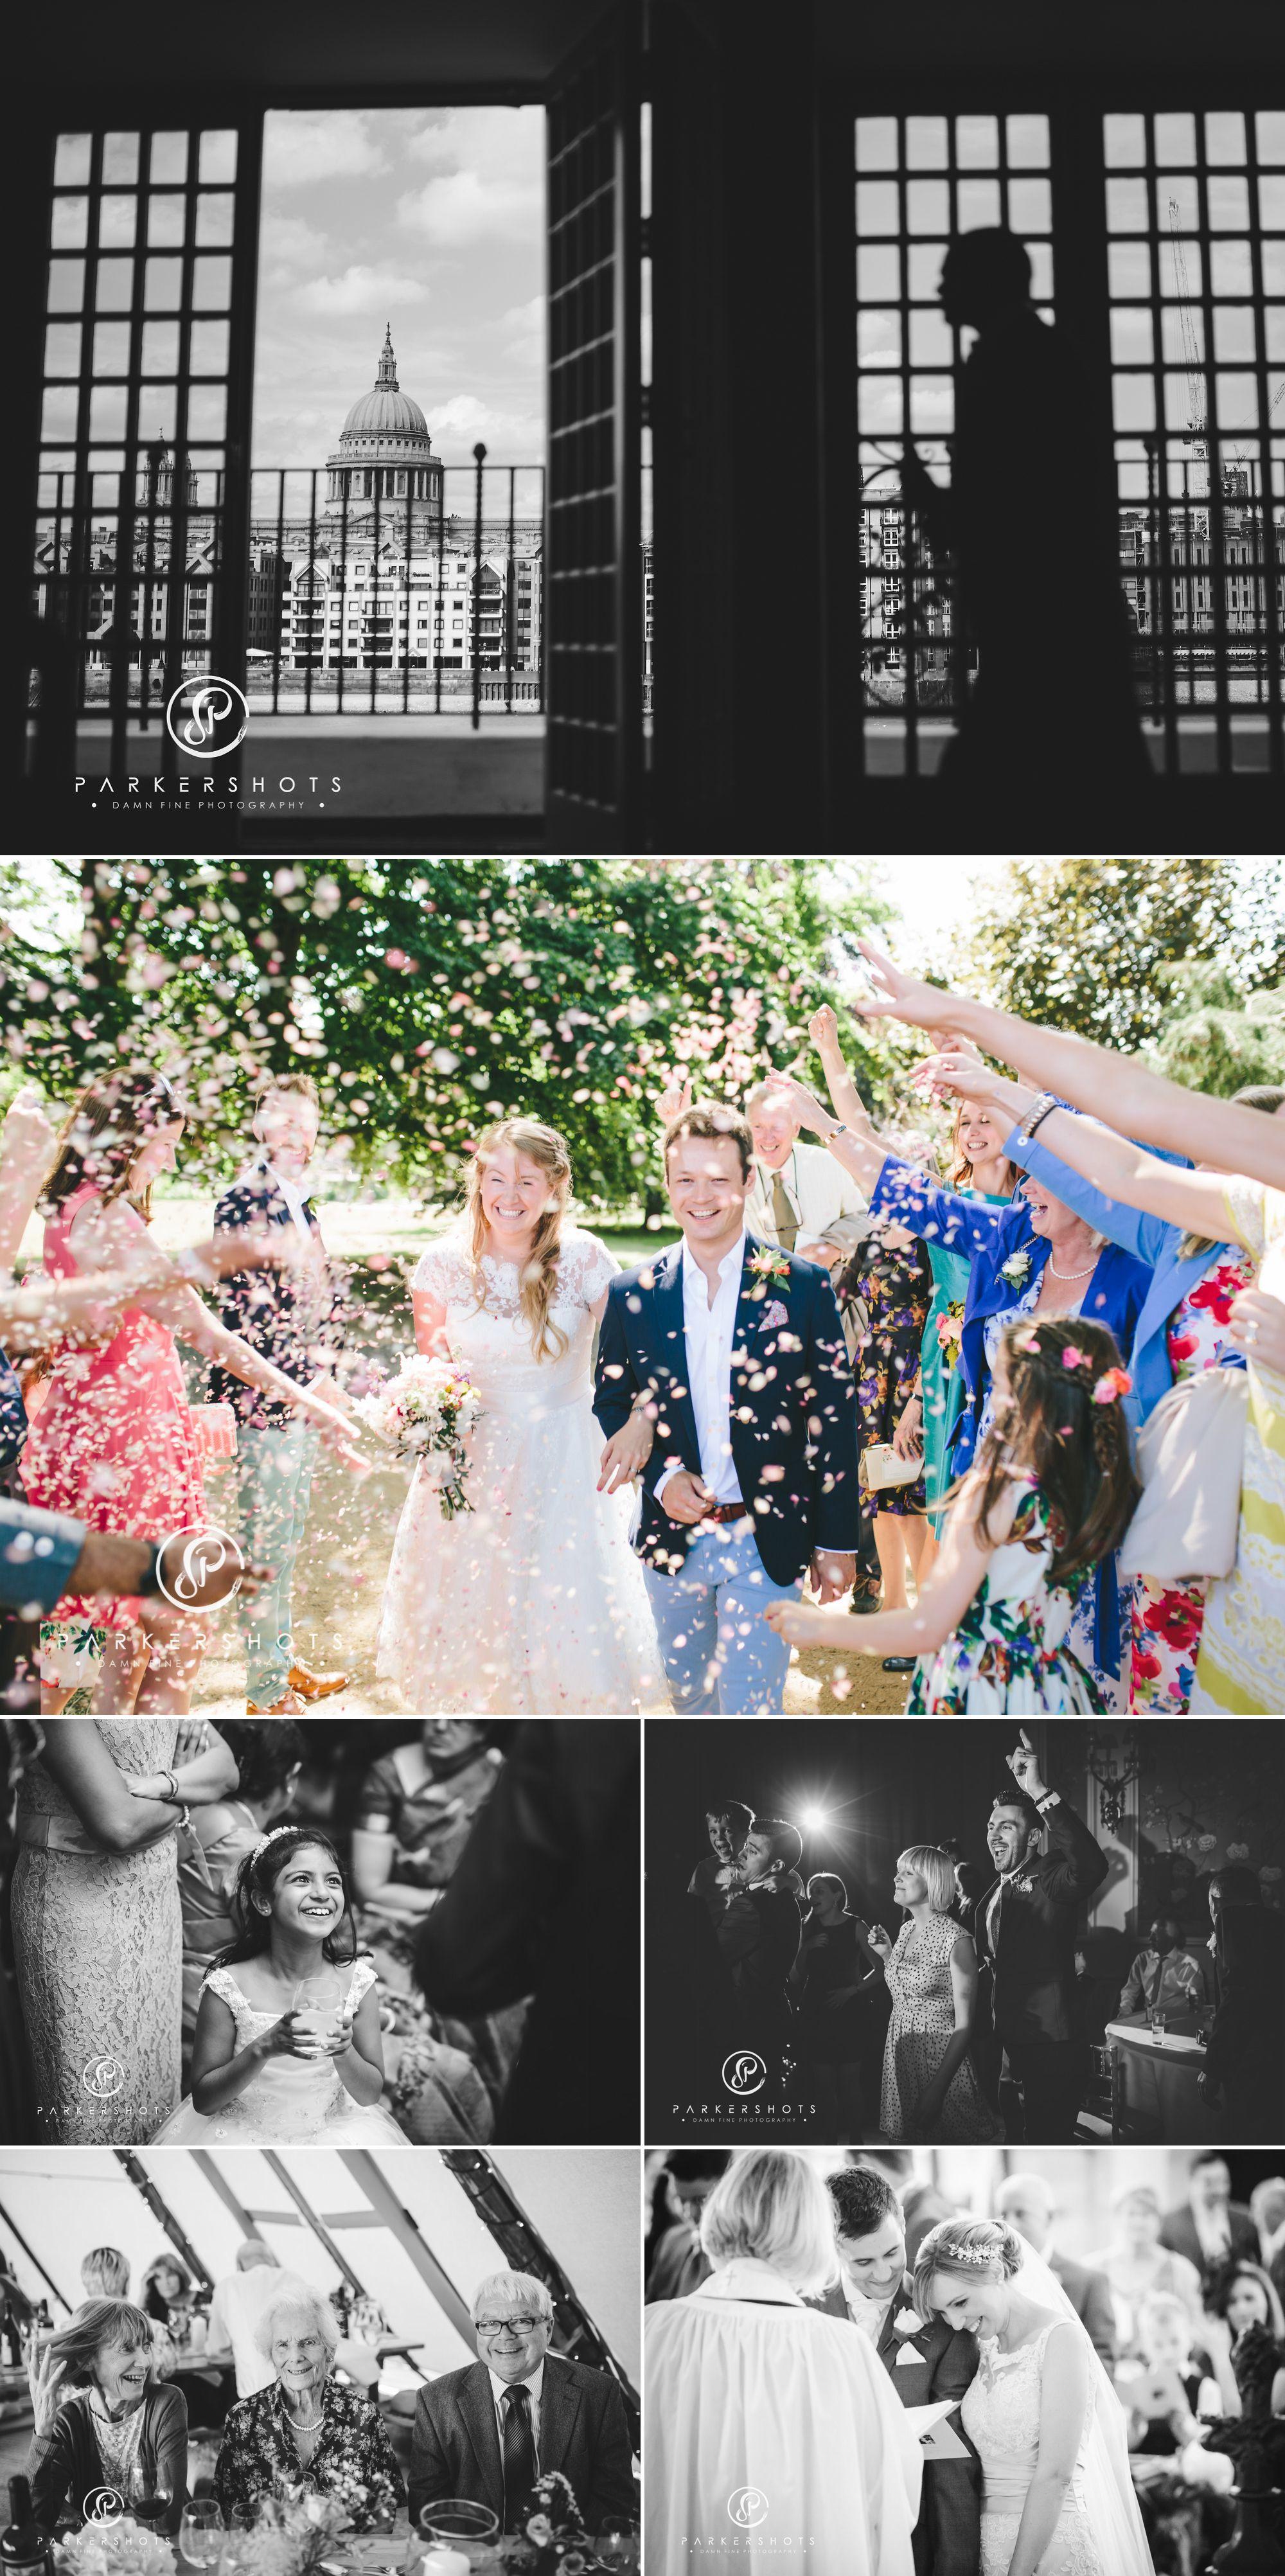 Best_Of_Wedding_Photographer_2015 16